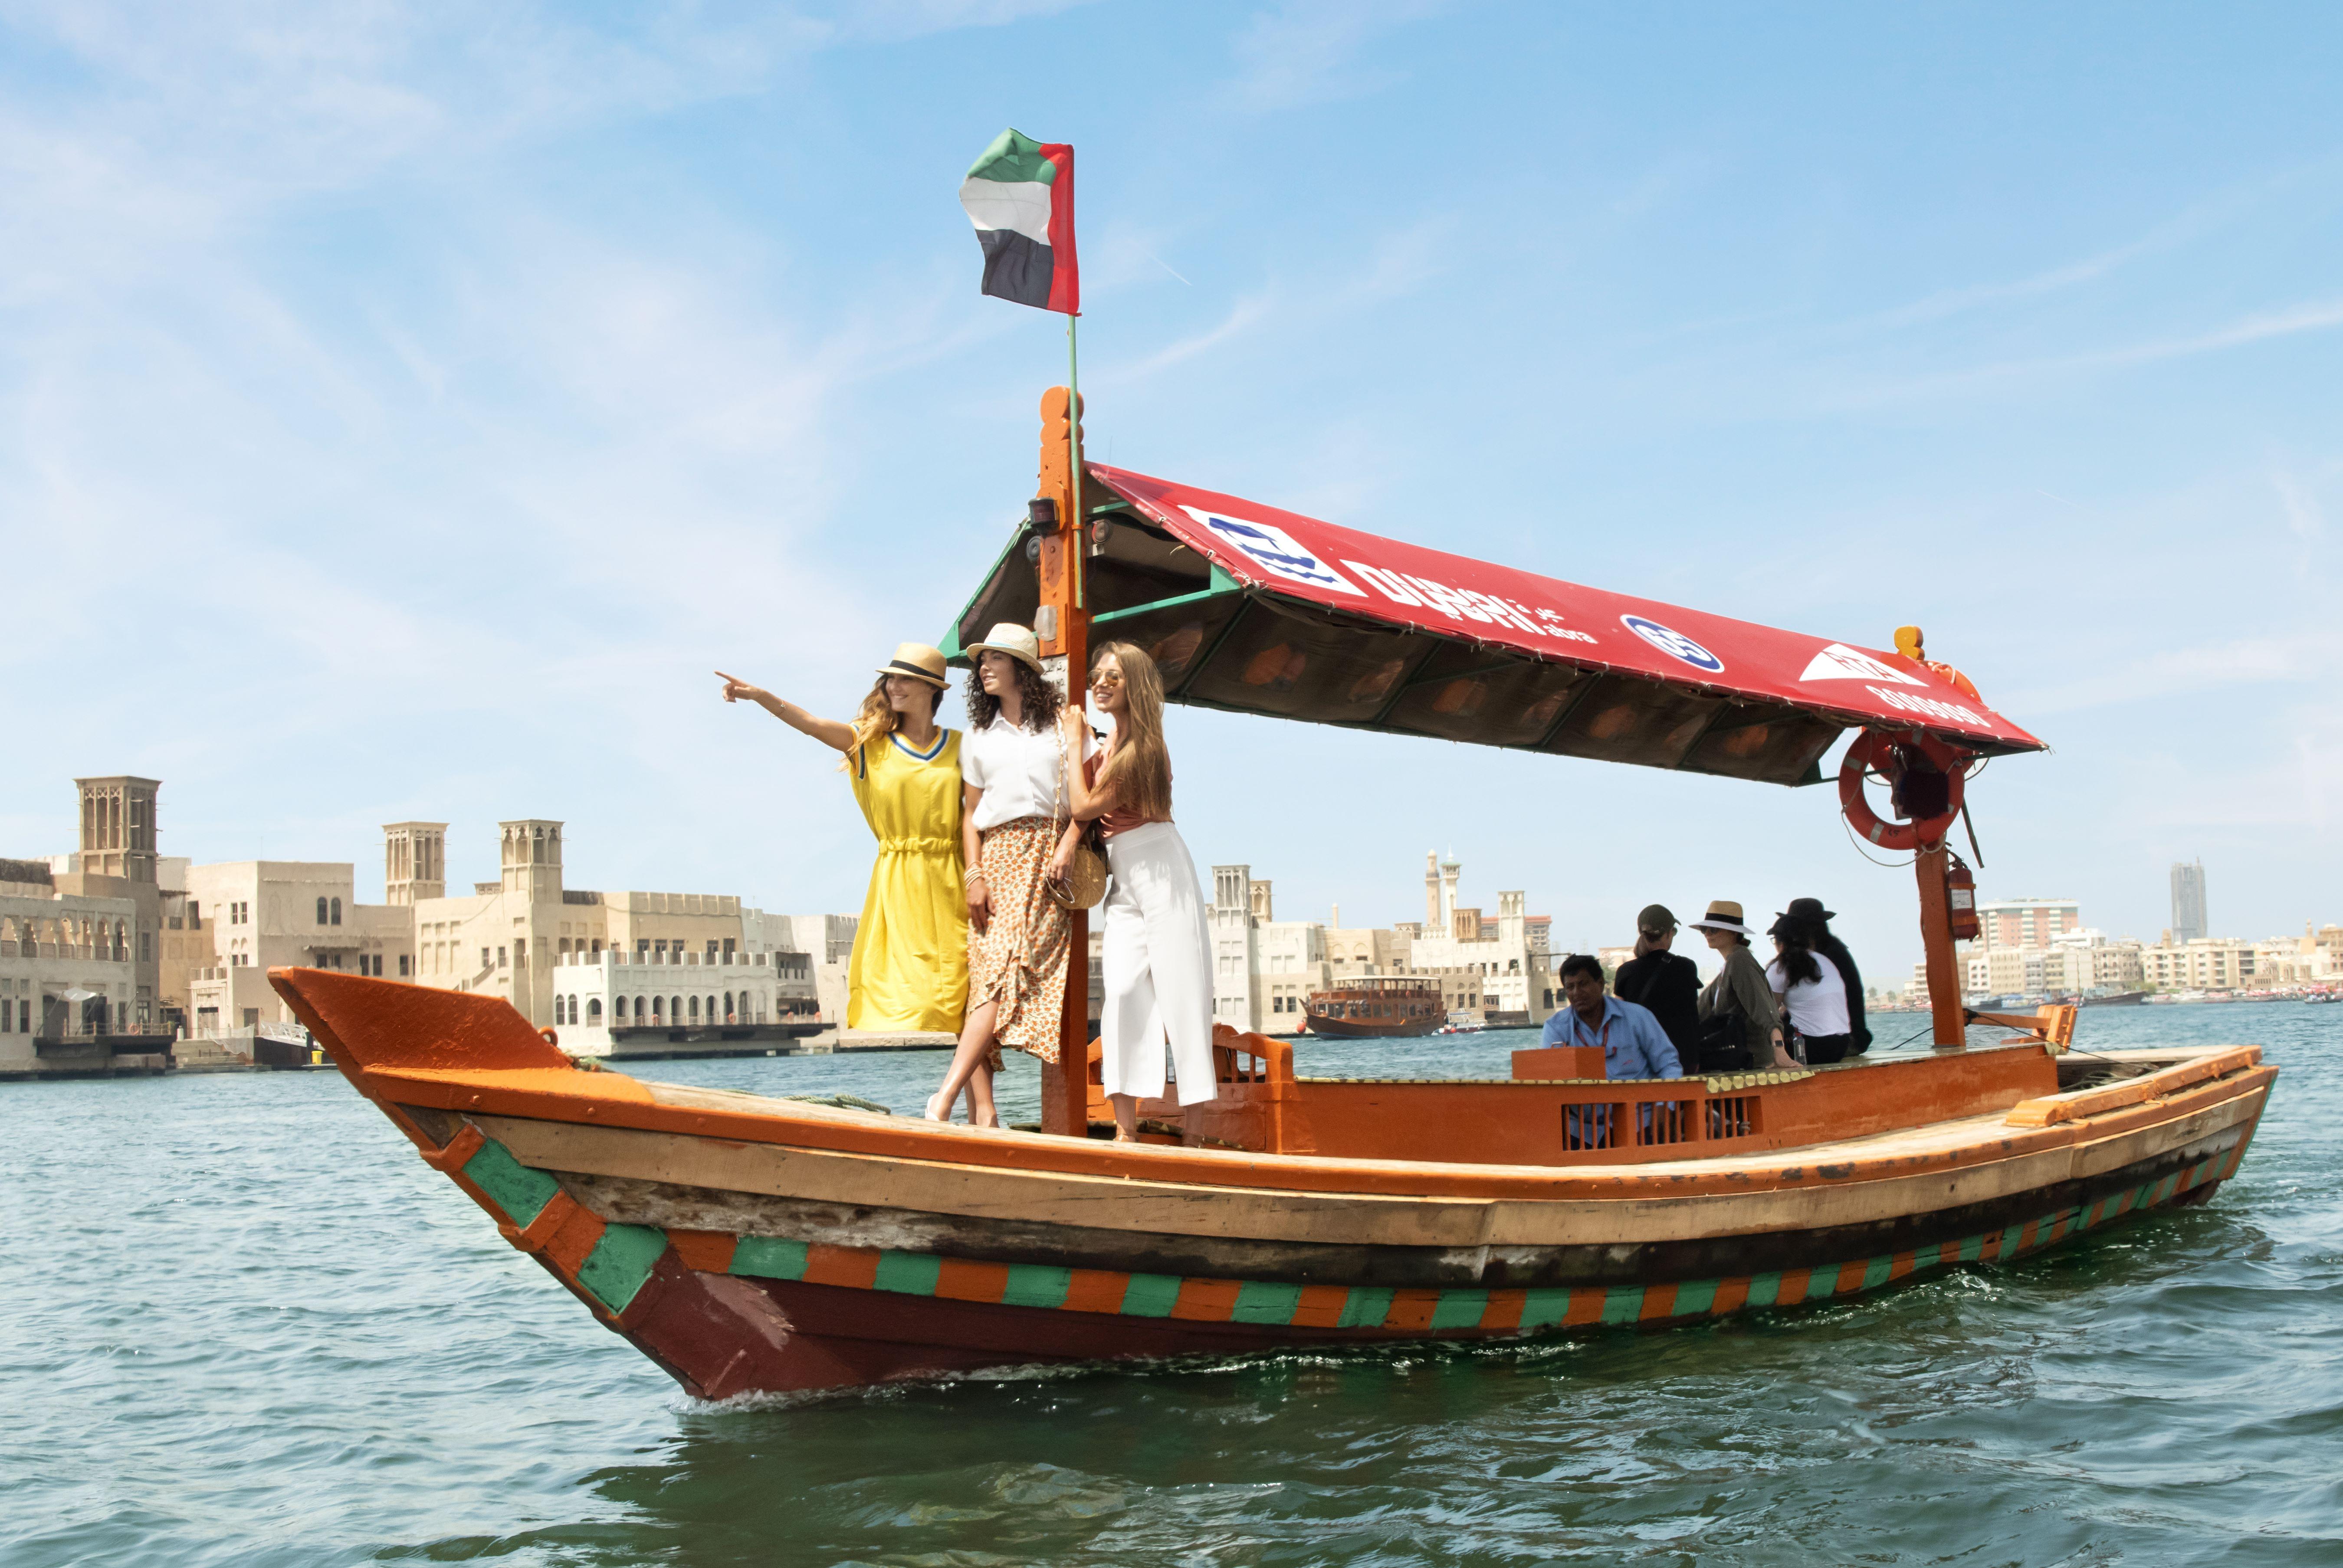 Dubai er kommet på Top 10-listen over de byer verden over, som Lonely Planet anbefaler på sine 2020-liste. Foto: Dubai Tourism.